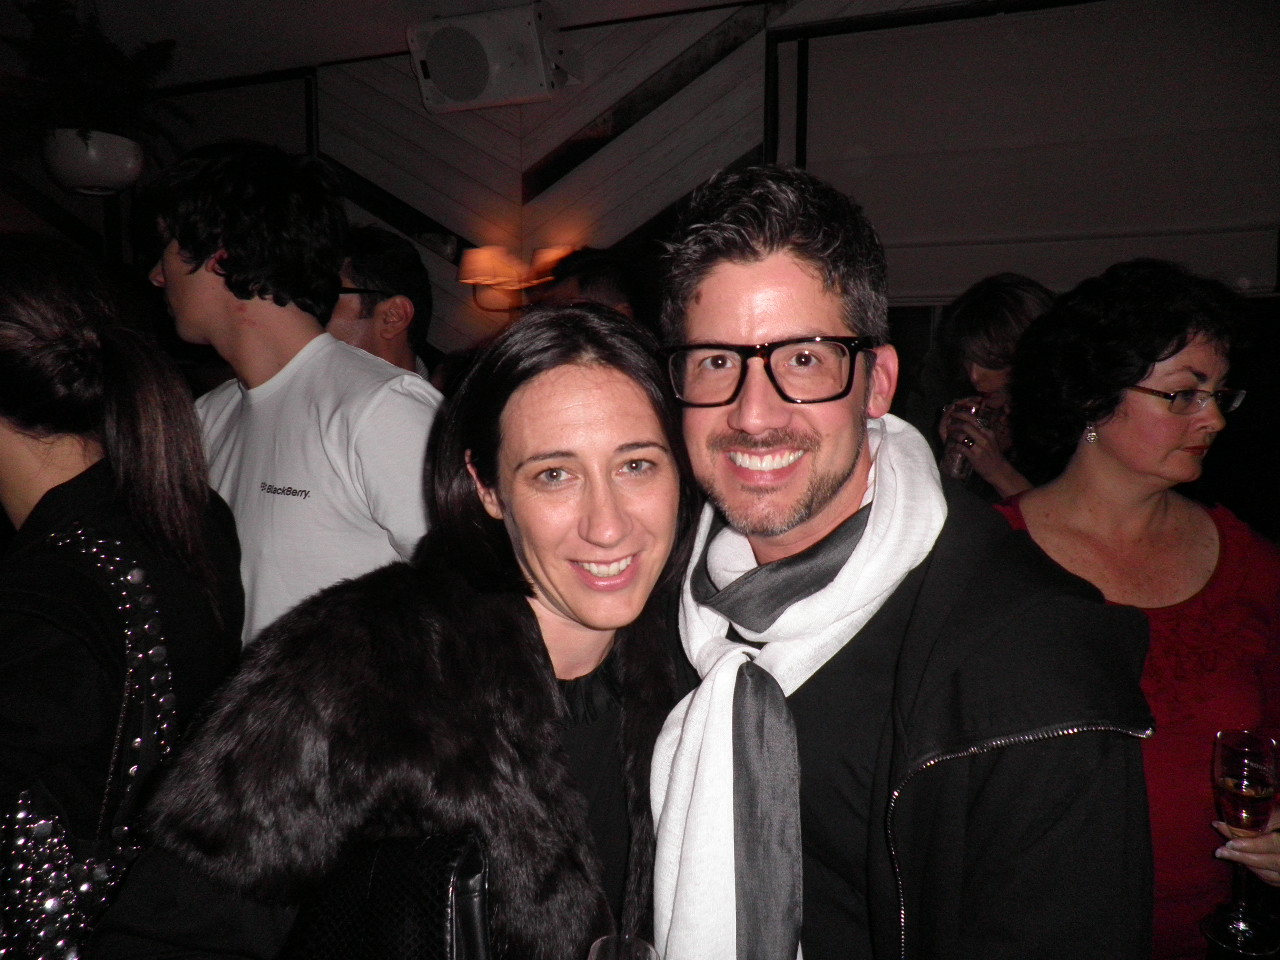 Edwina McCann & Robert